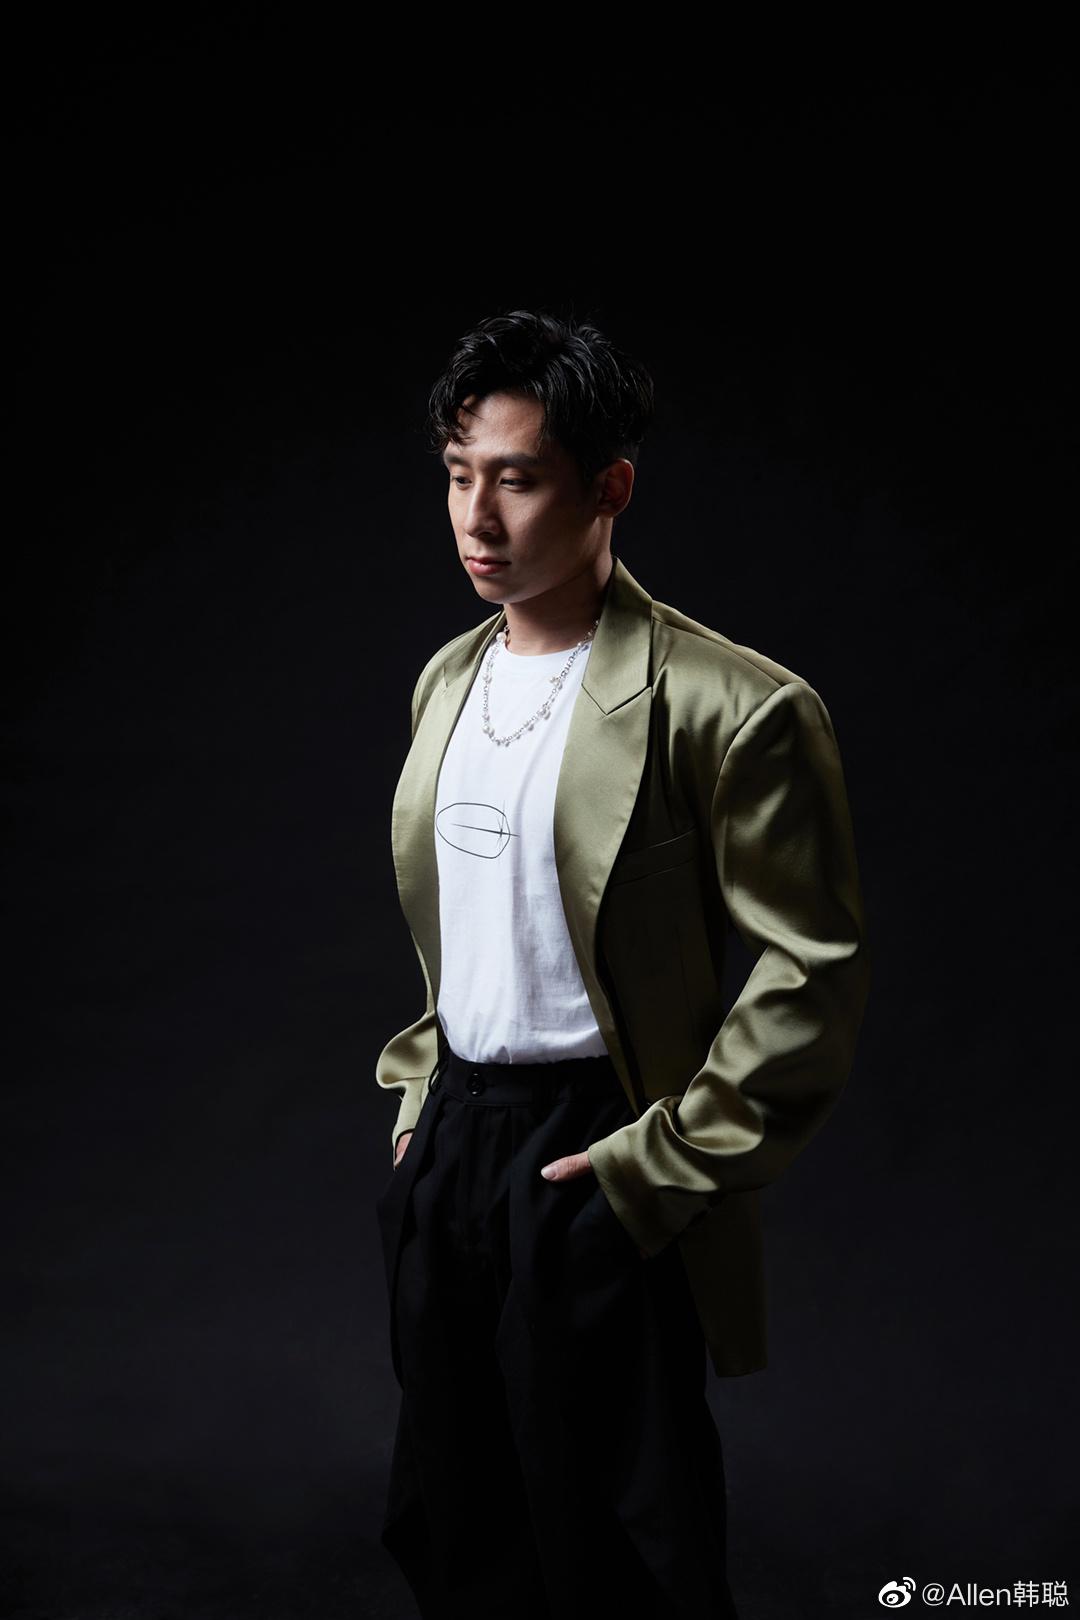 Вэньцзин Суй - Цун Хань / Wenjing SUI - Cong HAN CHN - Страница 18 2lphwt8sy499bw9a8cvrftedk